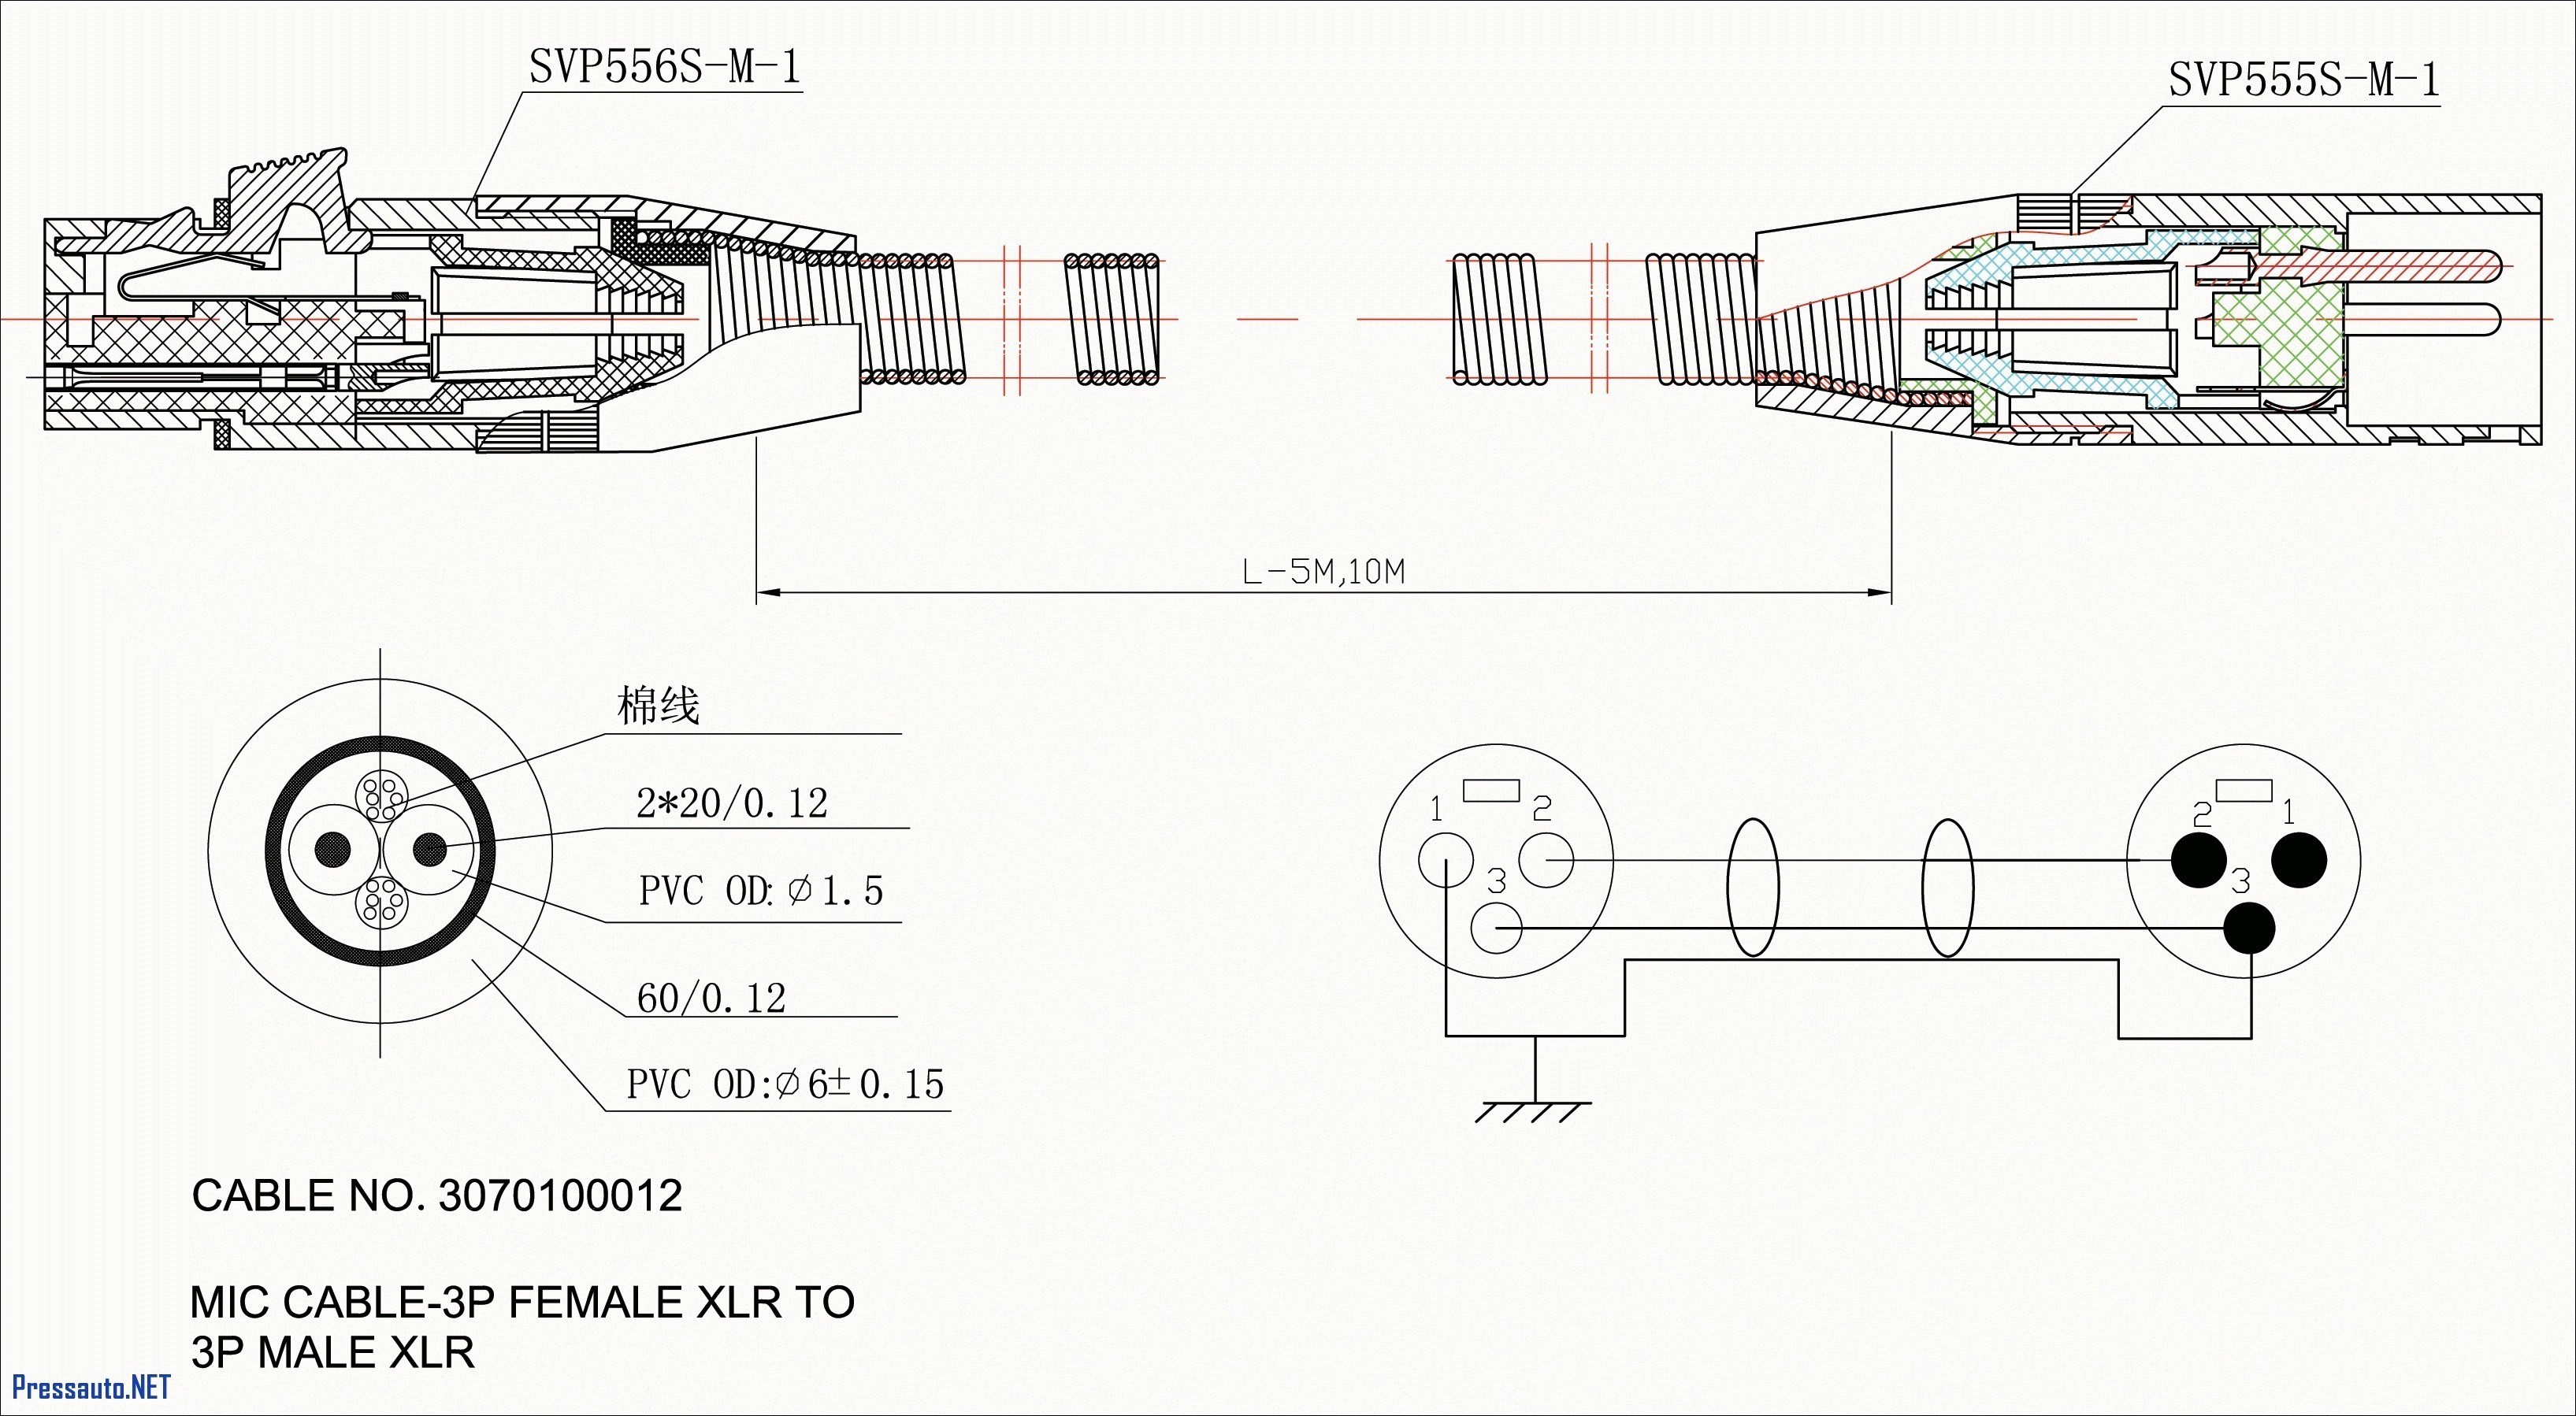 calamp gps wiring diagram otorva orggallery of calamp gps wiring diagram